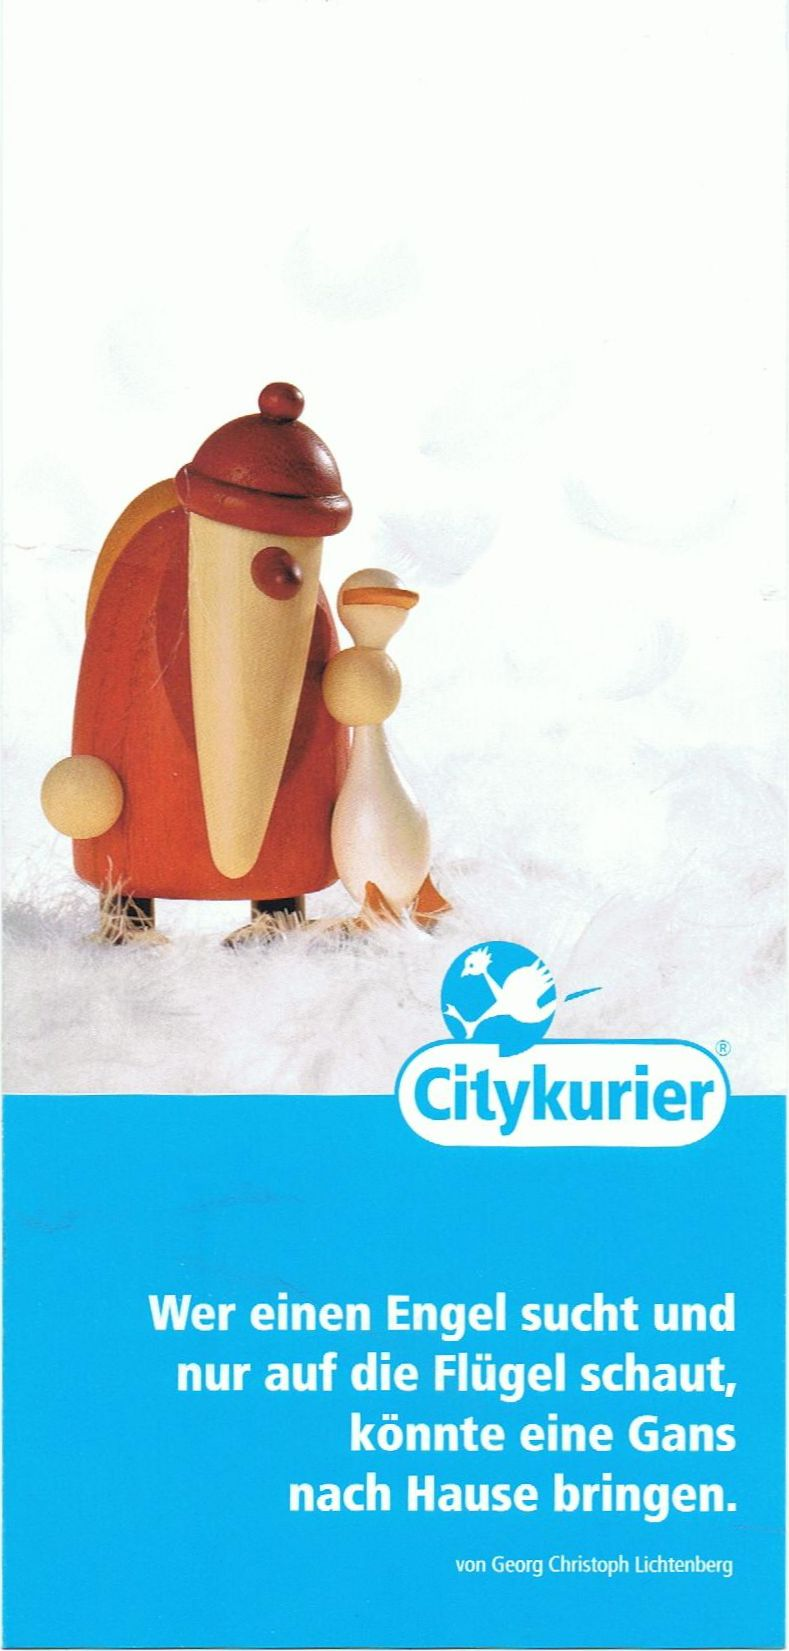 Citykurier Gs_20110